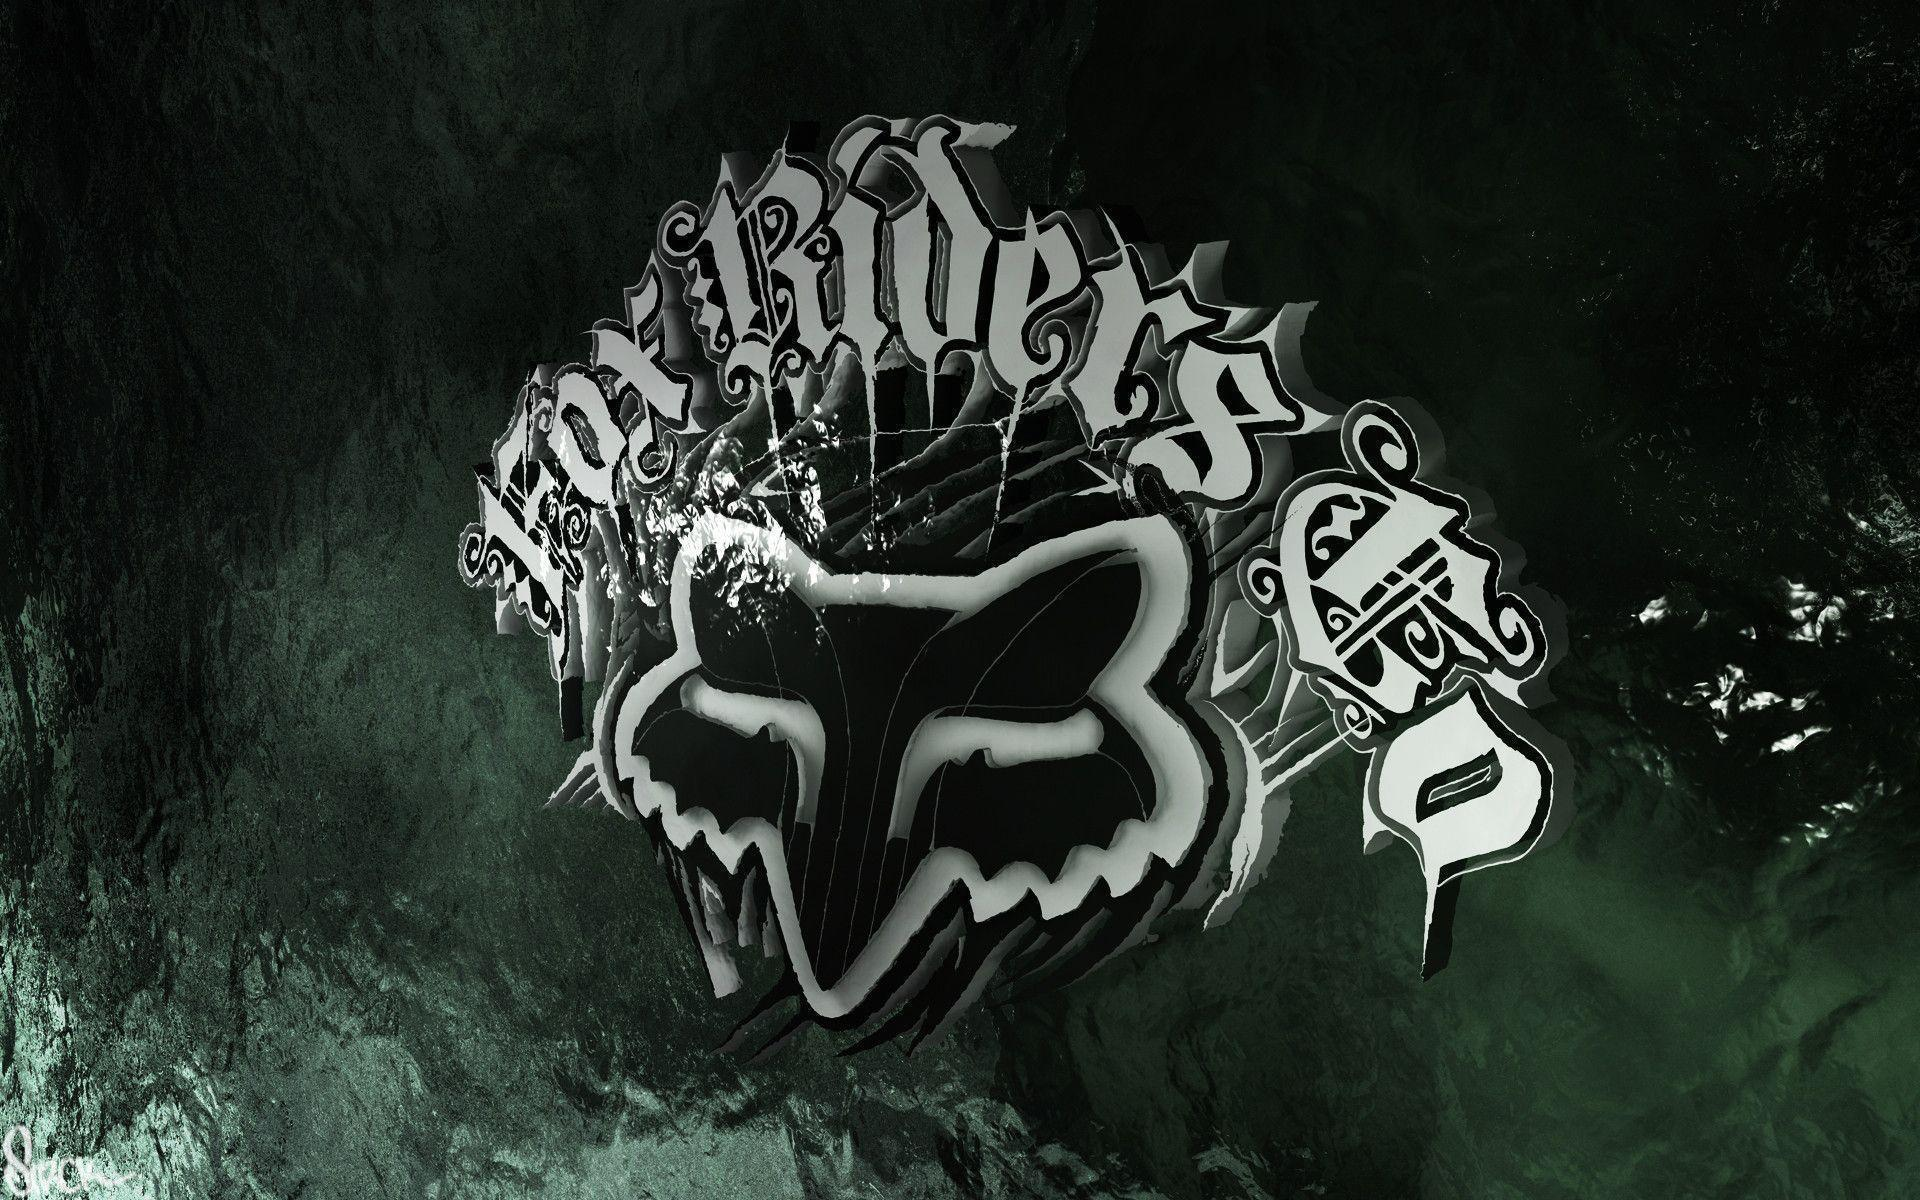 Fox Racing Logo Wallpapers Wallpaper Cave 1920x1200